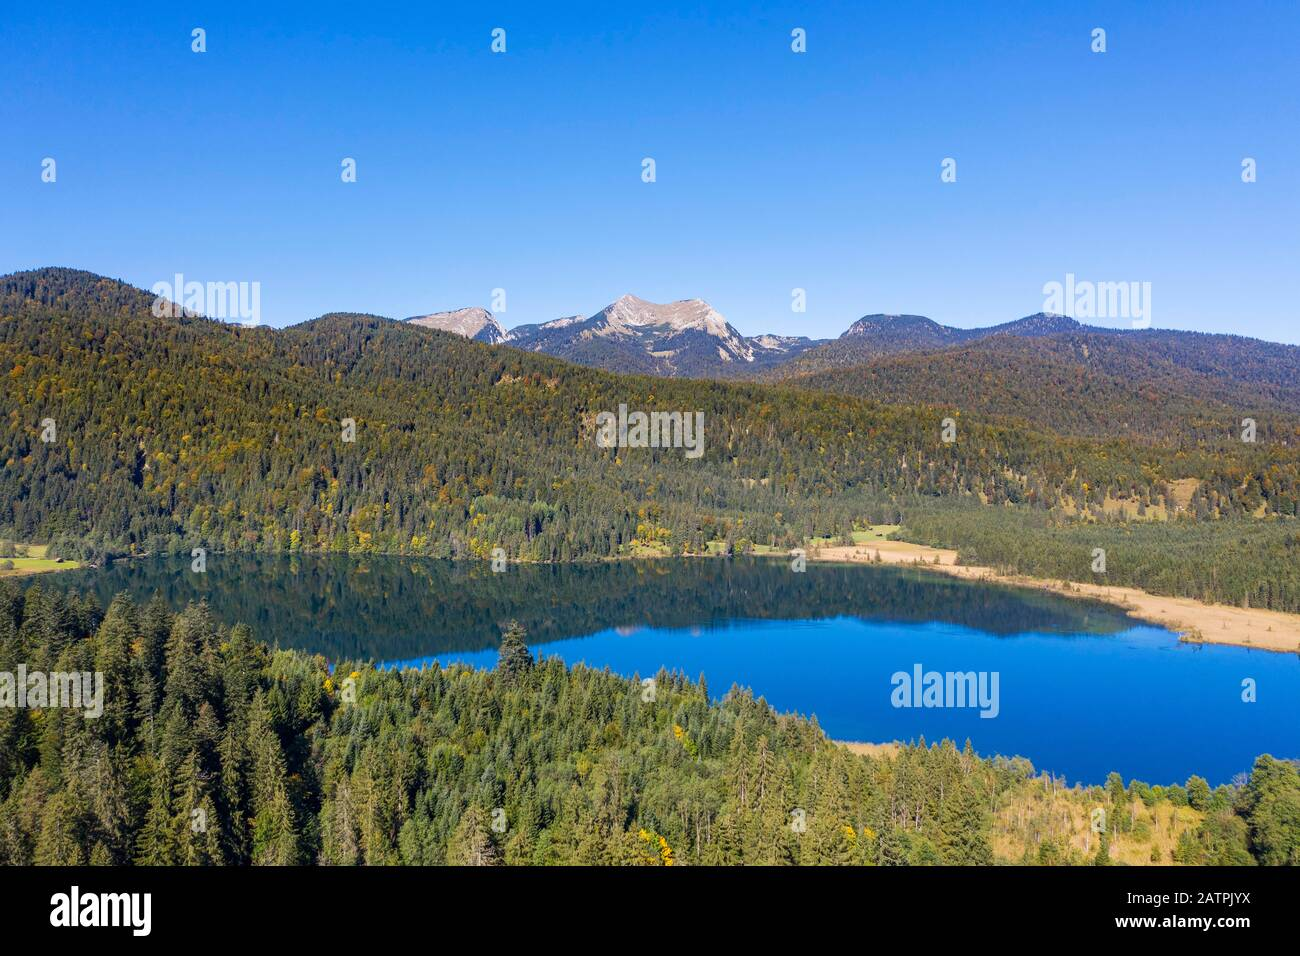 Lake Barmsee near Kruen, Berg Bischof and Krottenkopf in the Estergebirge, Werdenfelser Land, drone shot, Upper Bavaria, Bavaria, Germany Stock Photo